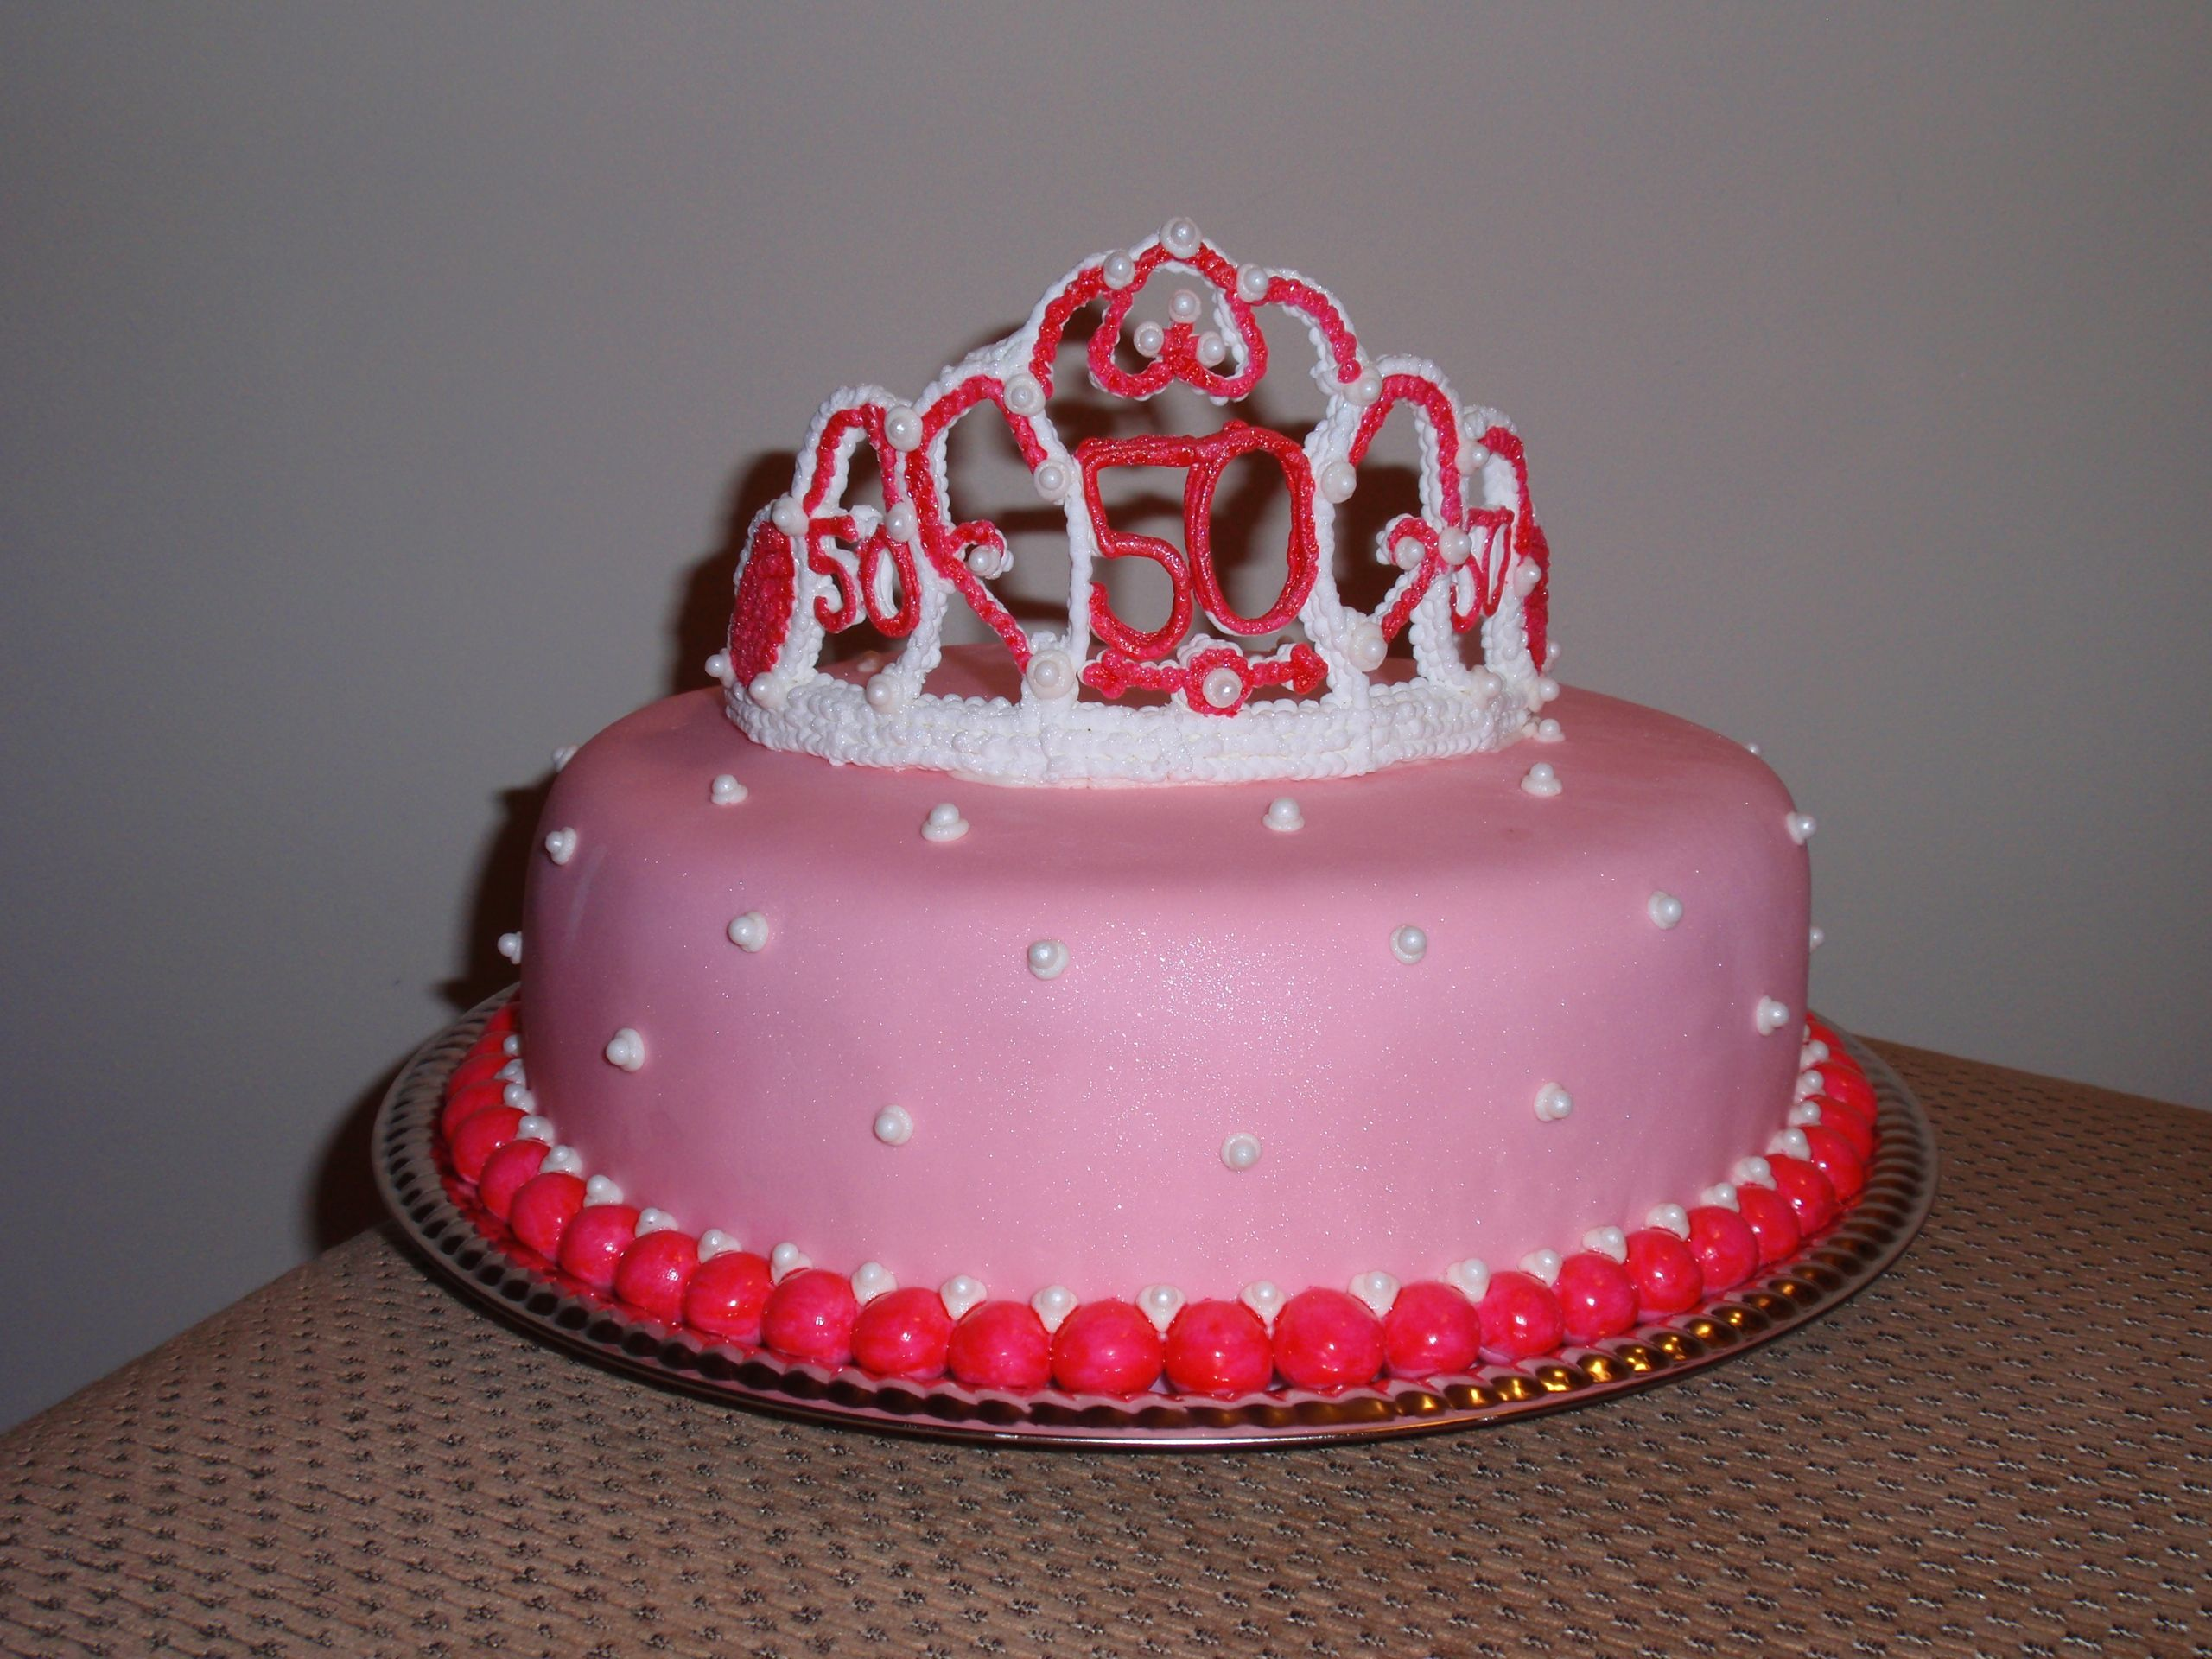 Pillow Cake with Tiara cake topper   Tiara cake topper